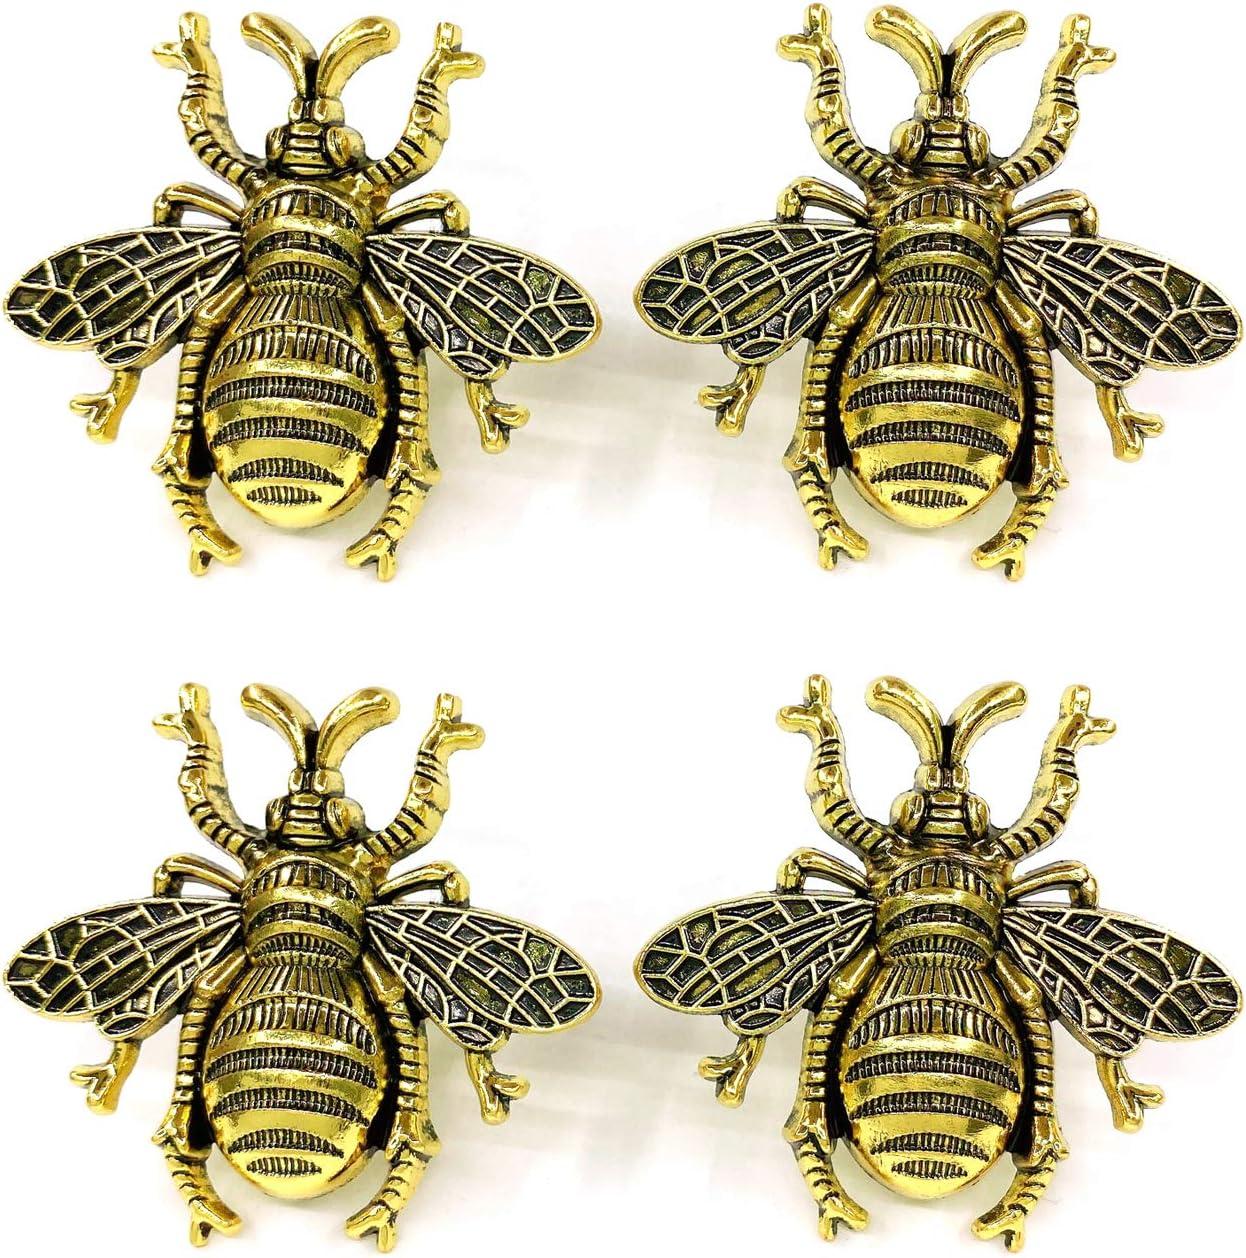 ZTie Bees Drawer knobs for Natural Home Furniture Decorations Cabinet Knobs Bathroom Decor Dresser Pulls Handles Housewarming Gift (Antique Gold (Set of 4 pcs))